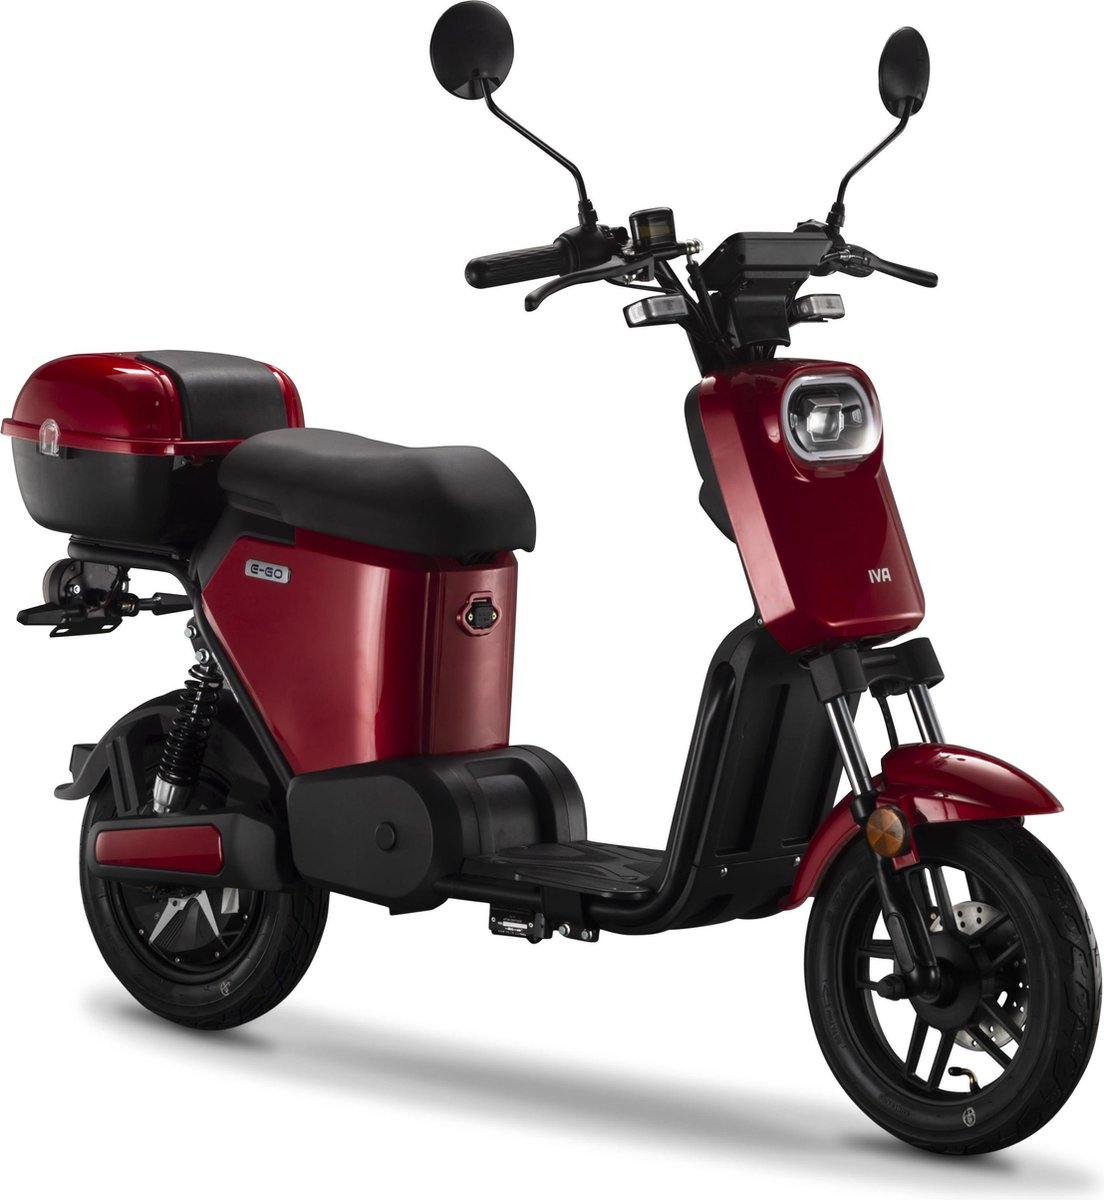 IVA E-GO S2 Elektrische Scooter Rood